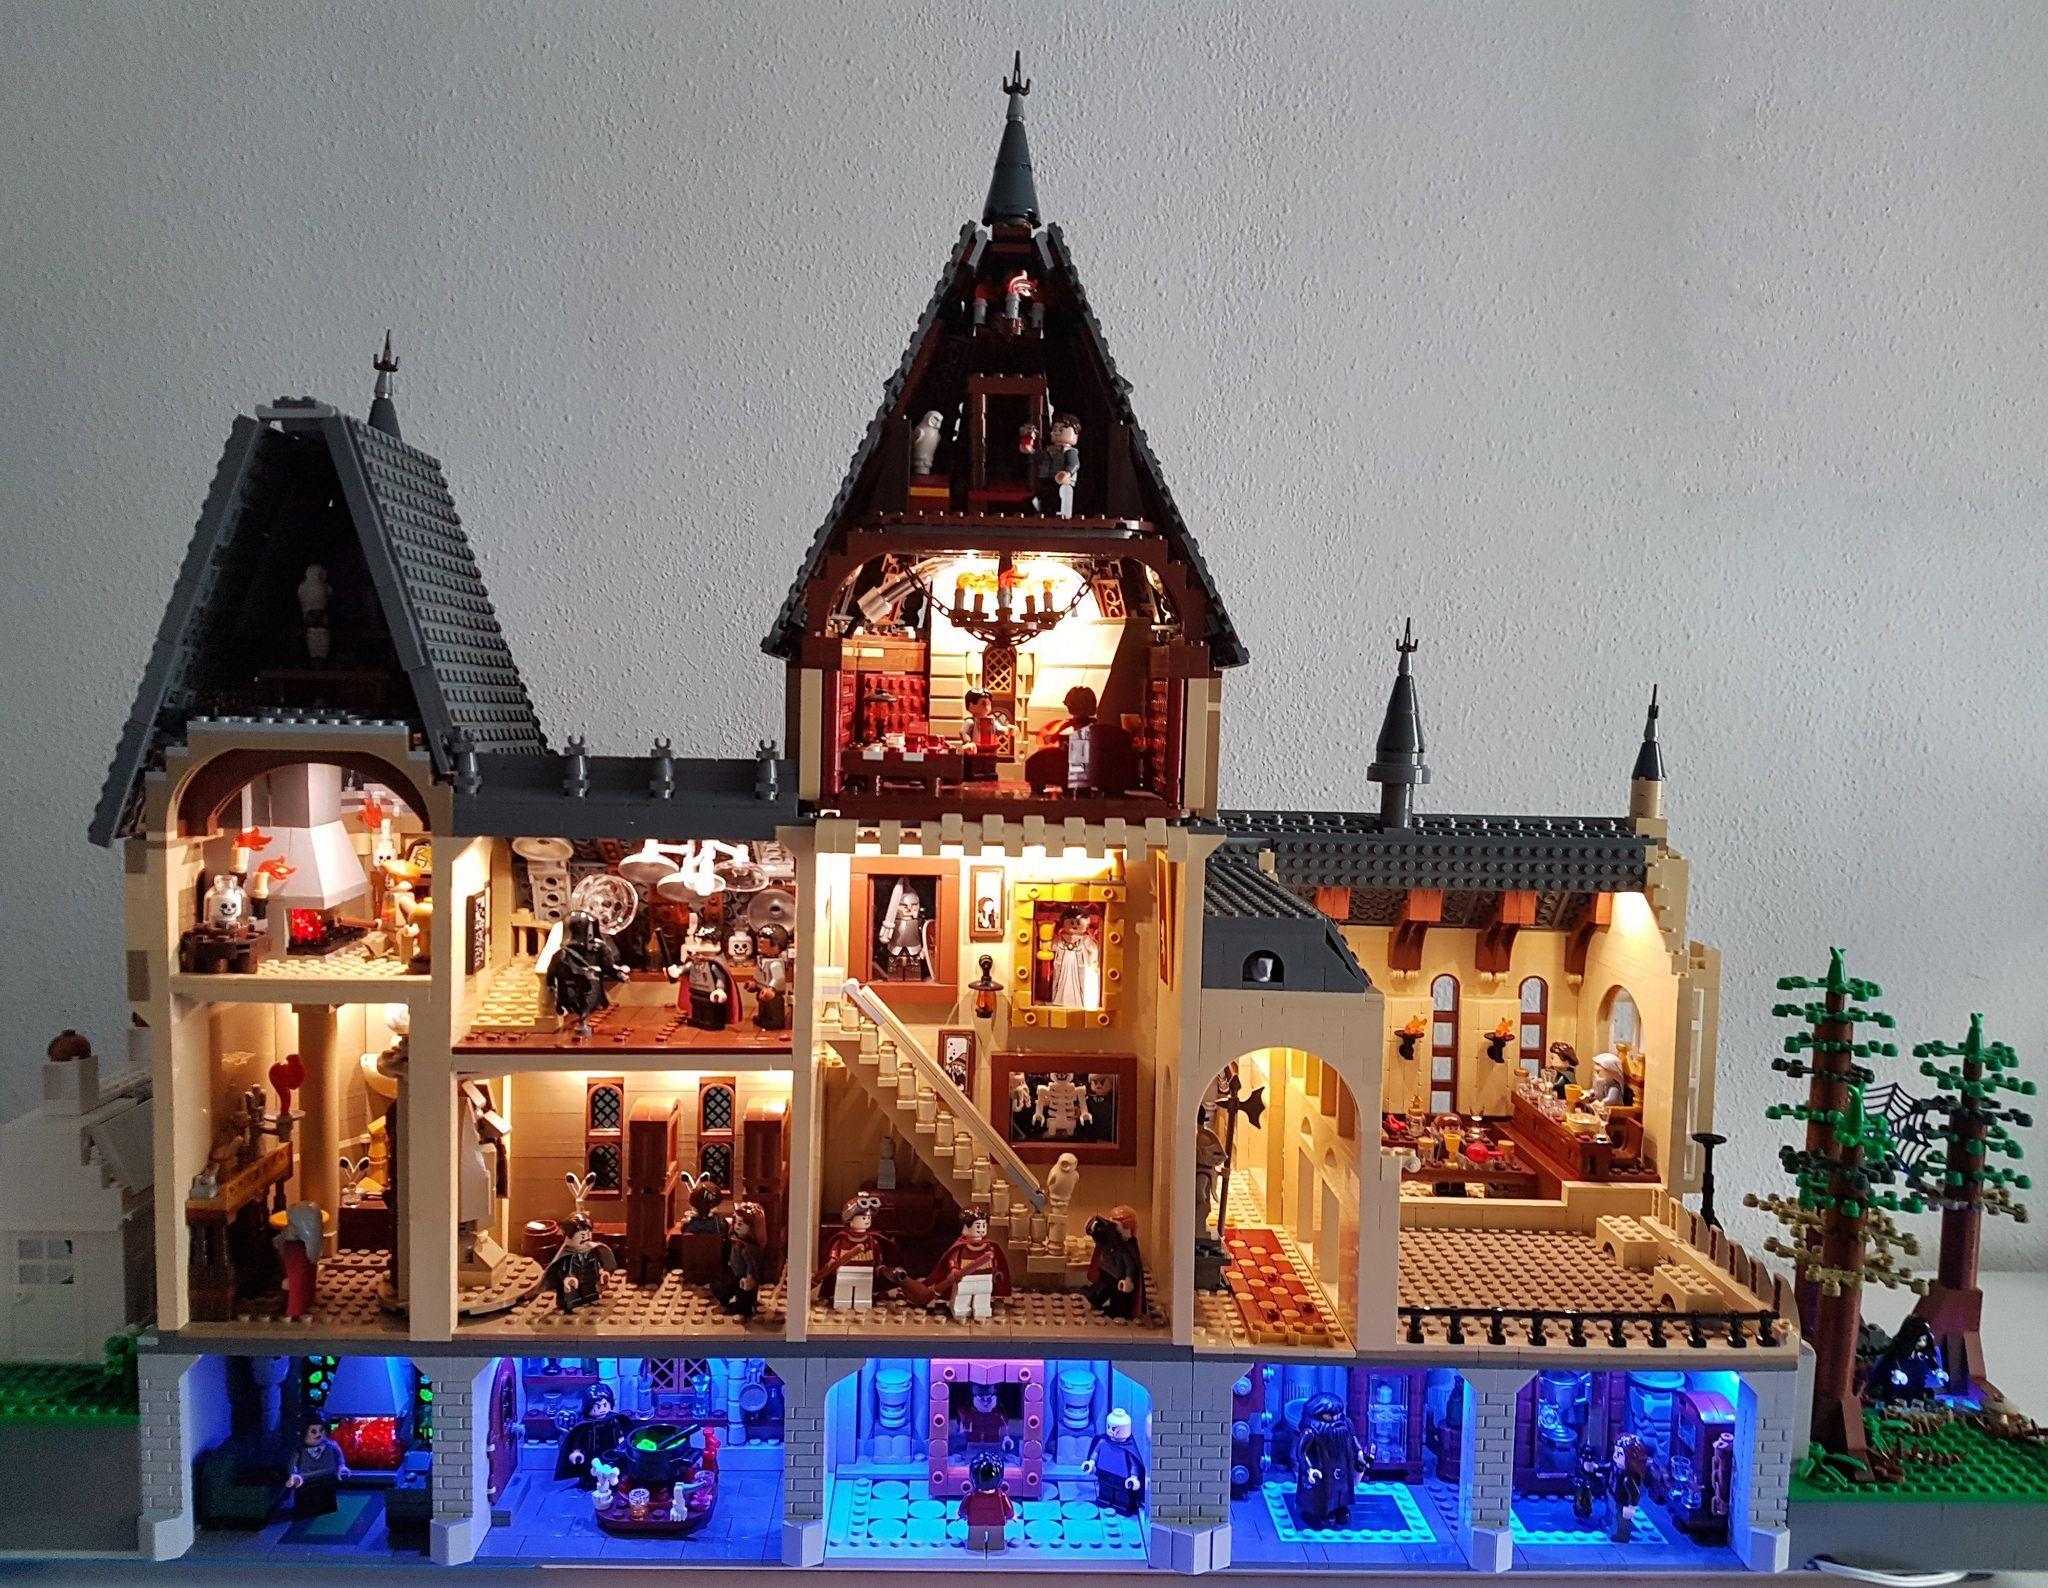 Hogwarts Castle Interior Lego Harry Potter Harry Potter Lego Sets Harry Potter Dolls